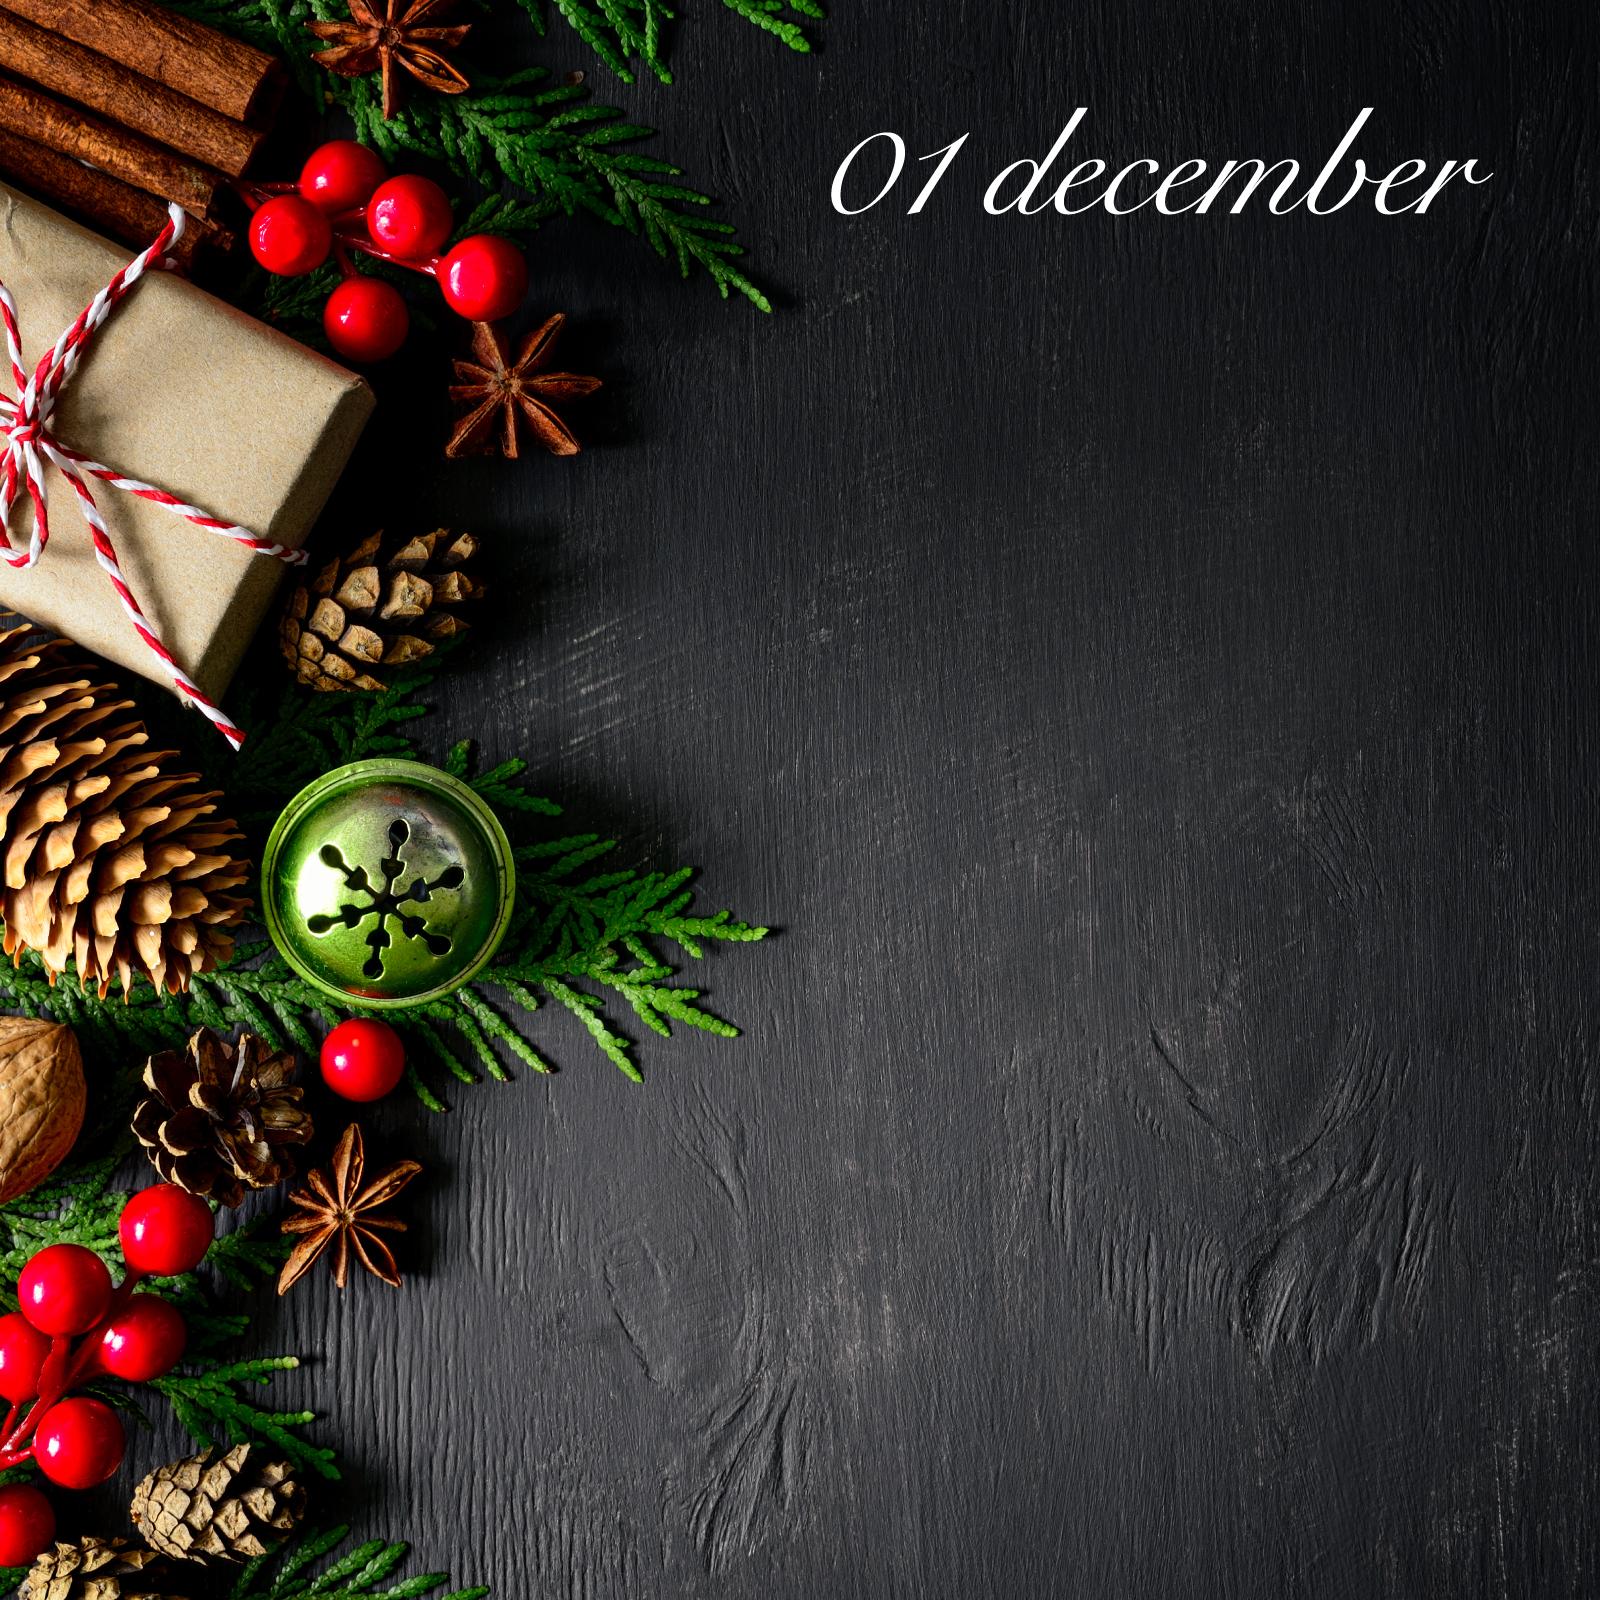 1 december